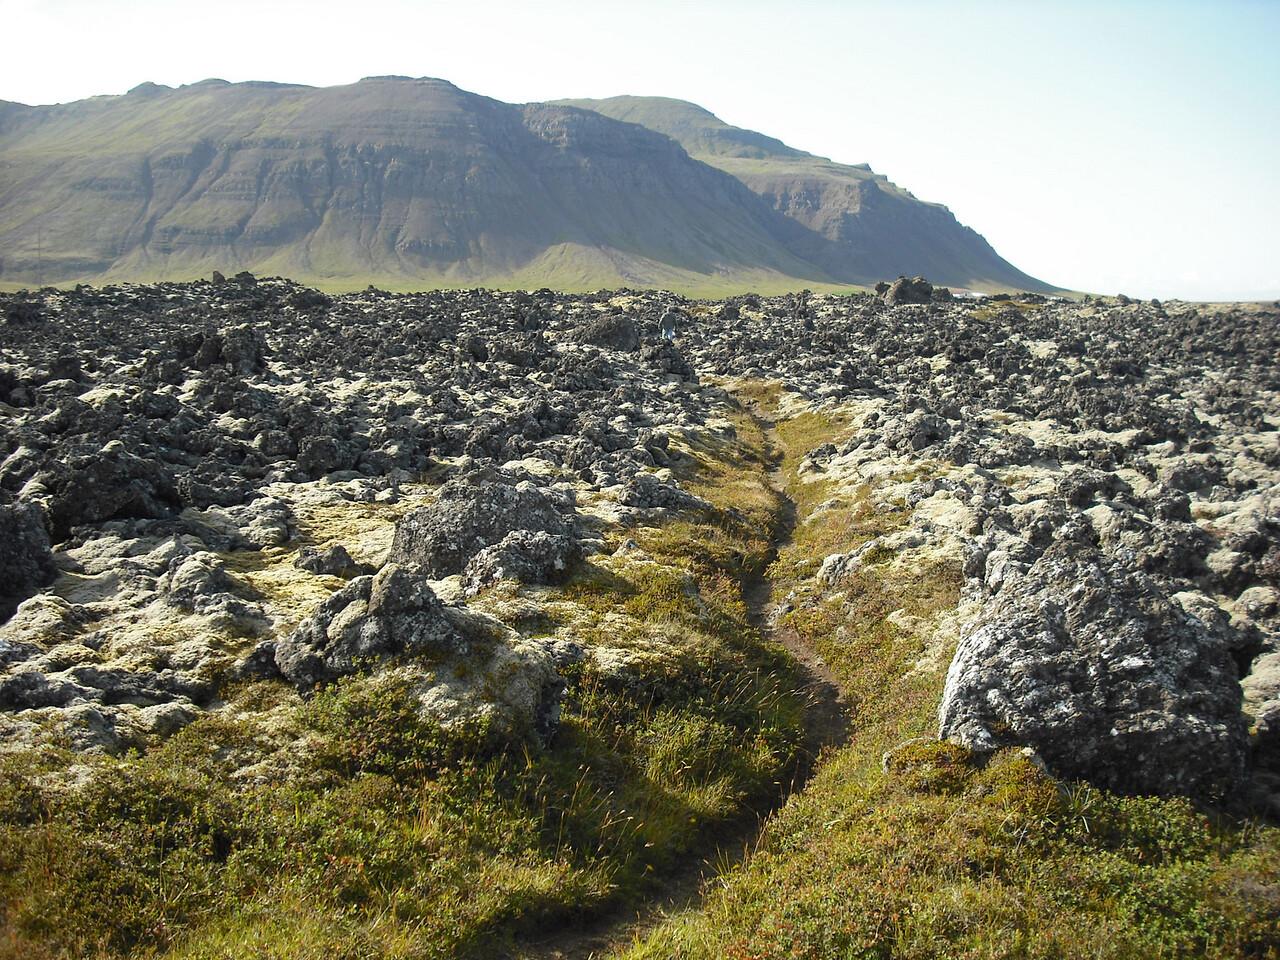 Look at that path those berserkers cut!  Good job, boys!